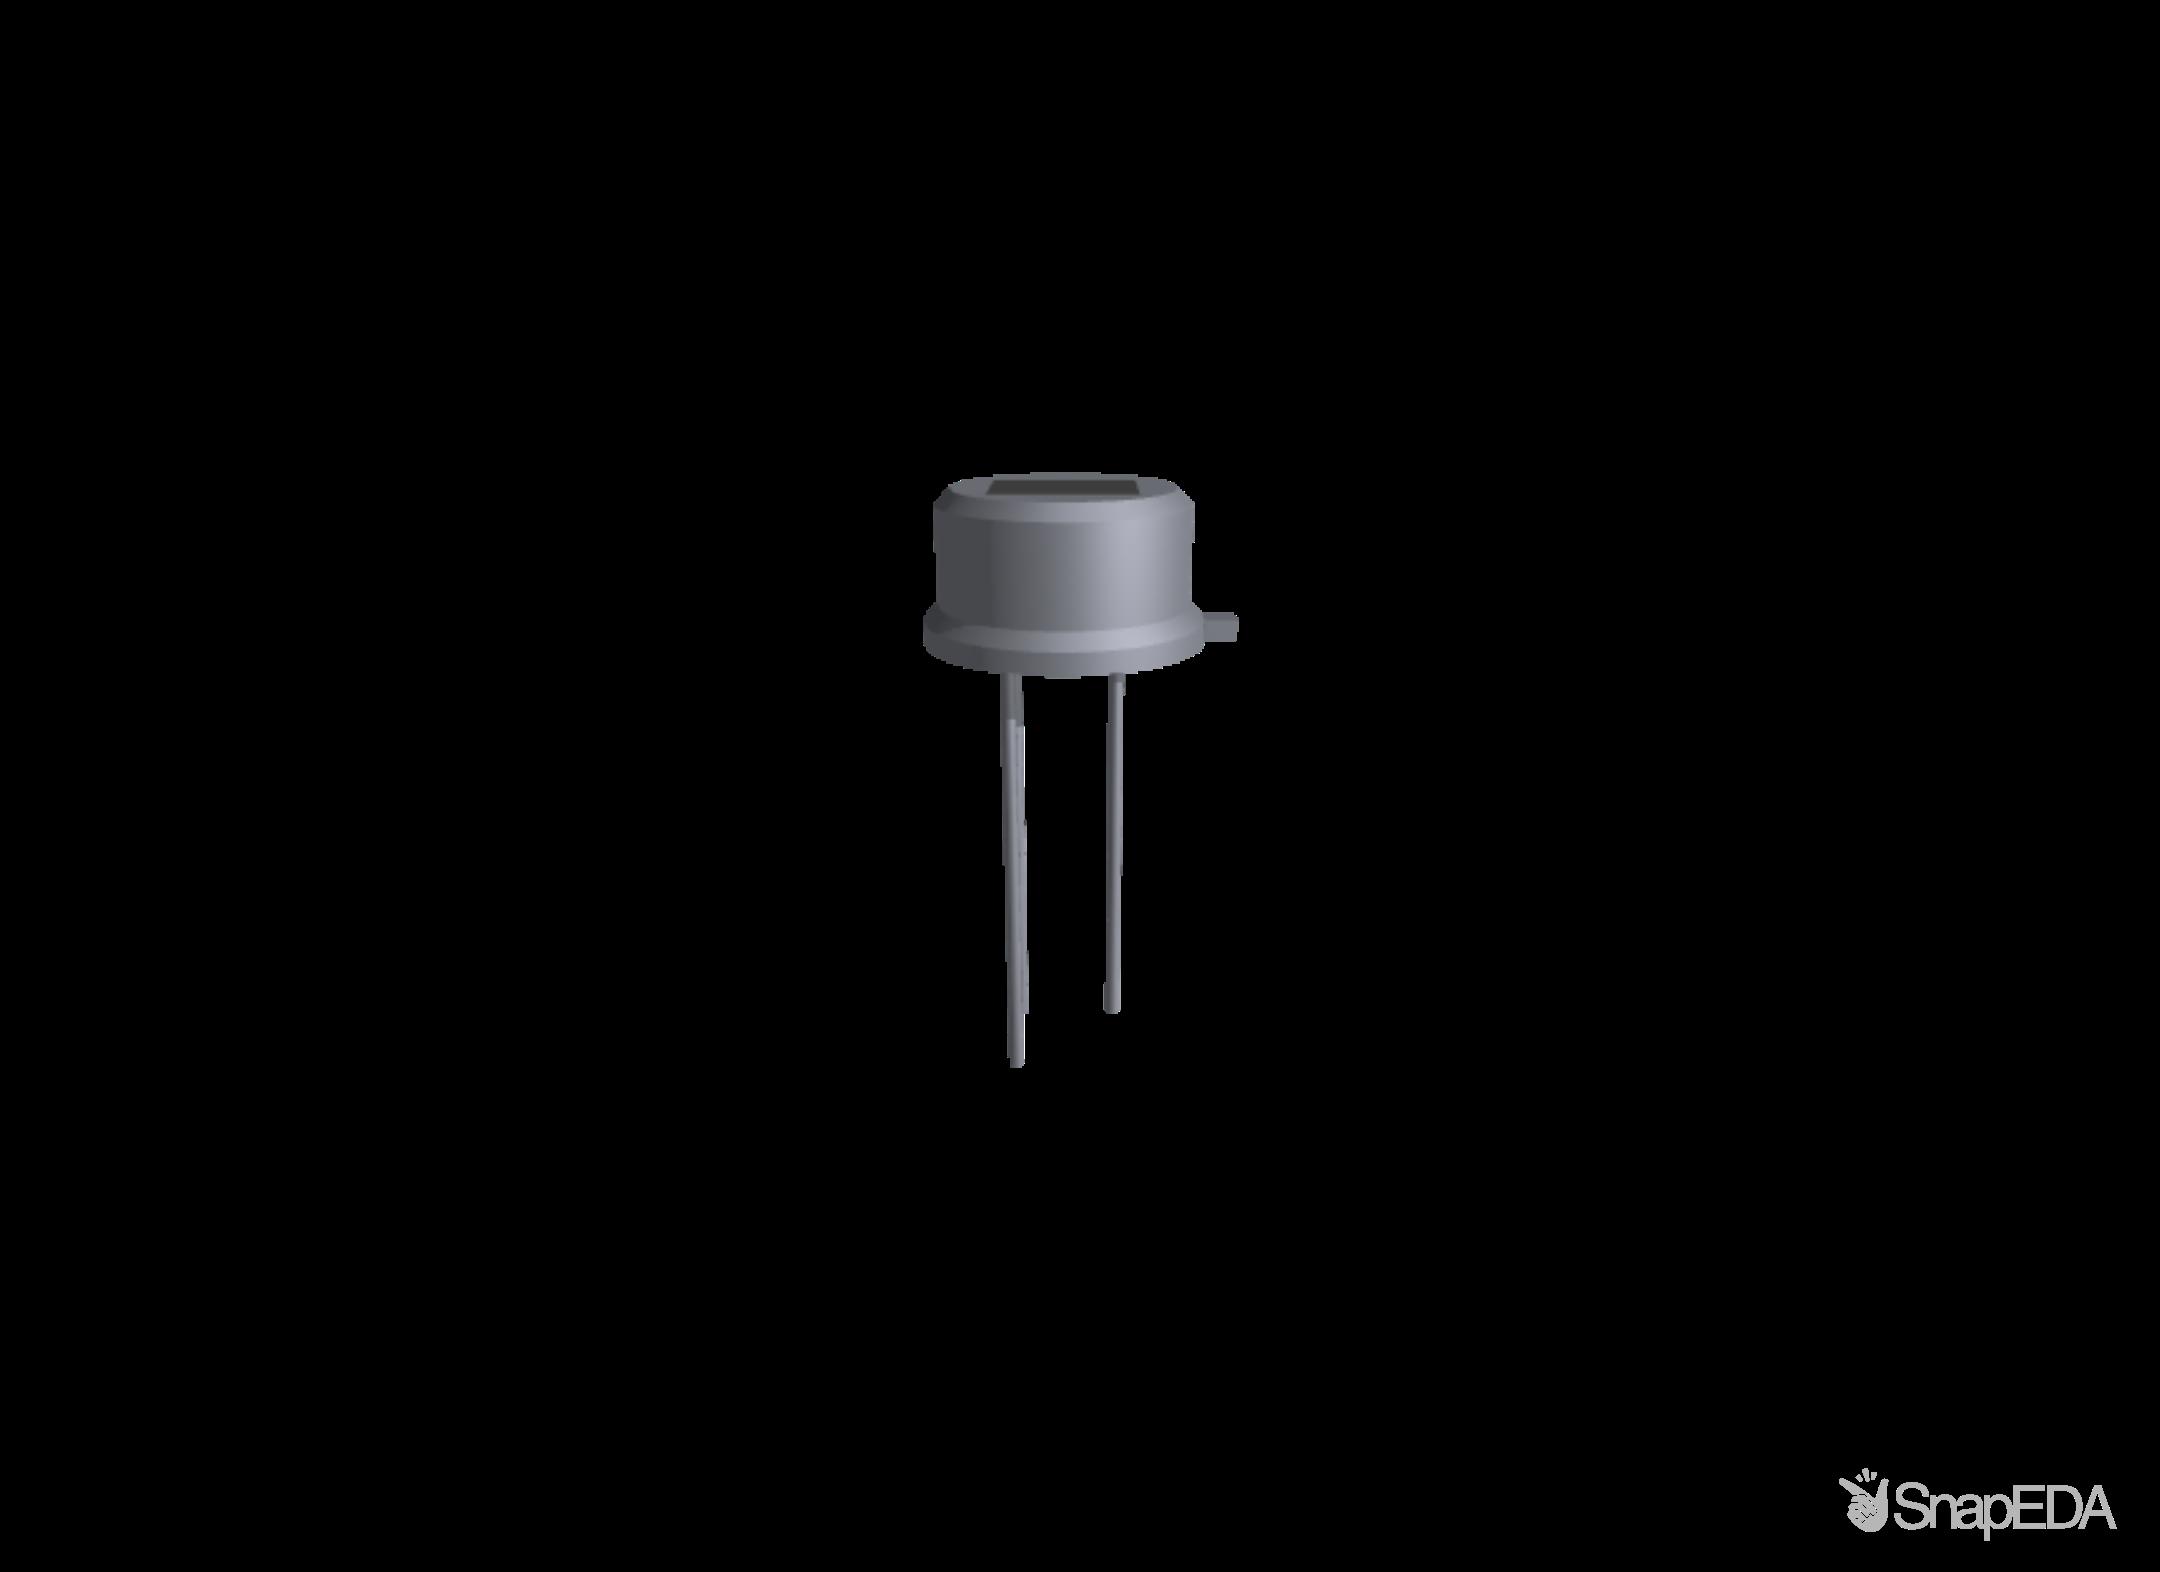 IRA-S230ST01 3D Model